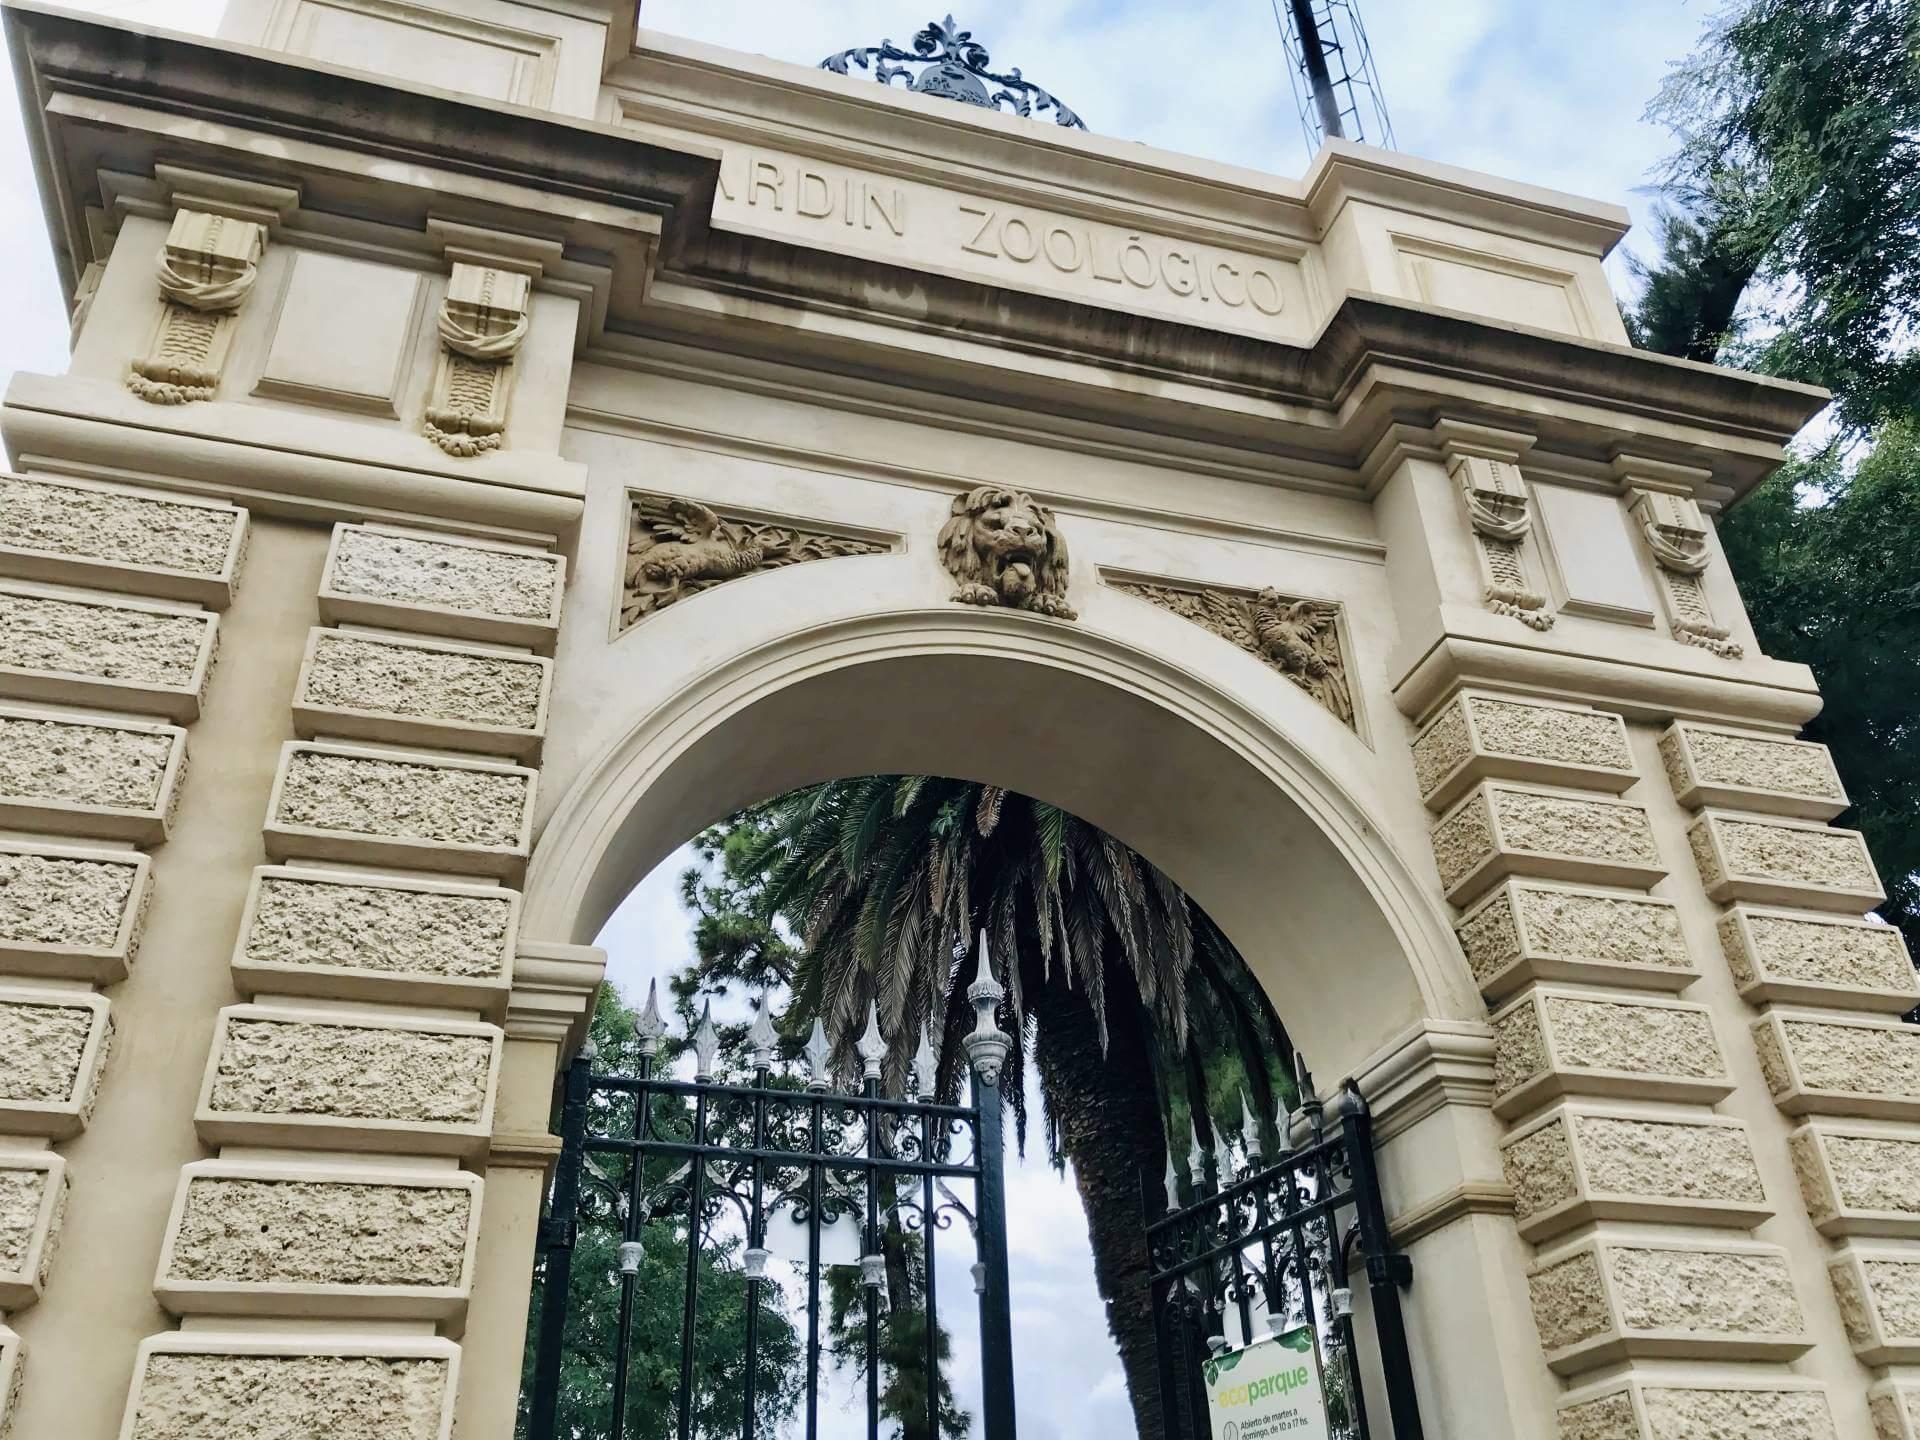 Entrance Parque Ecologico